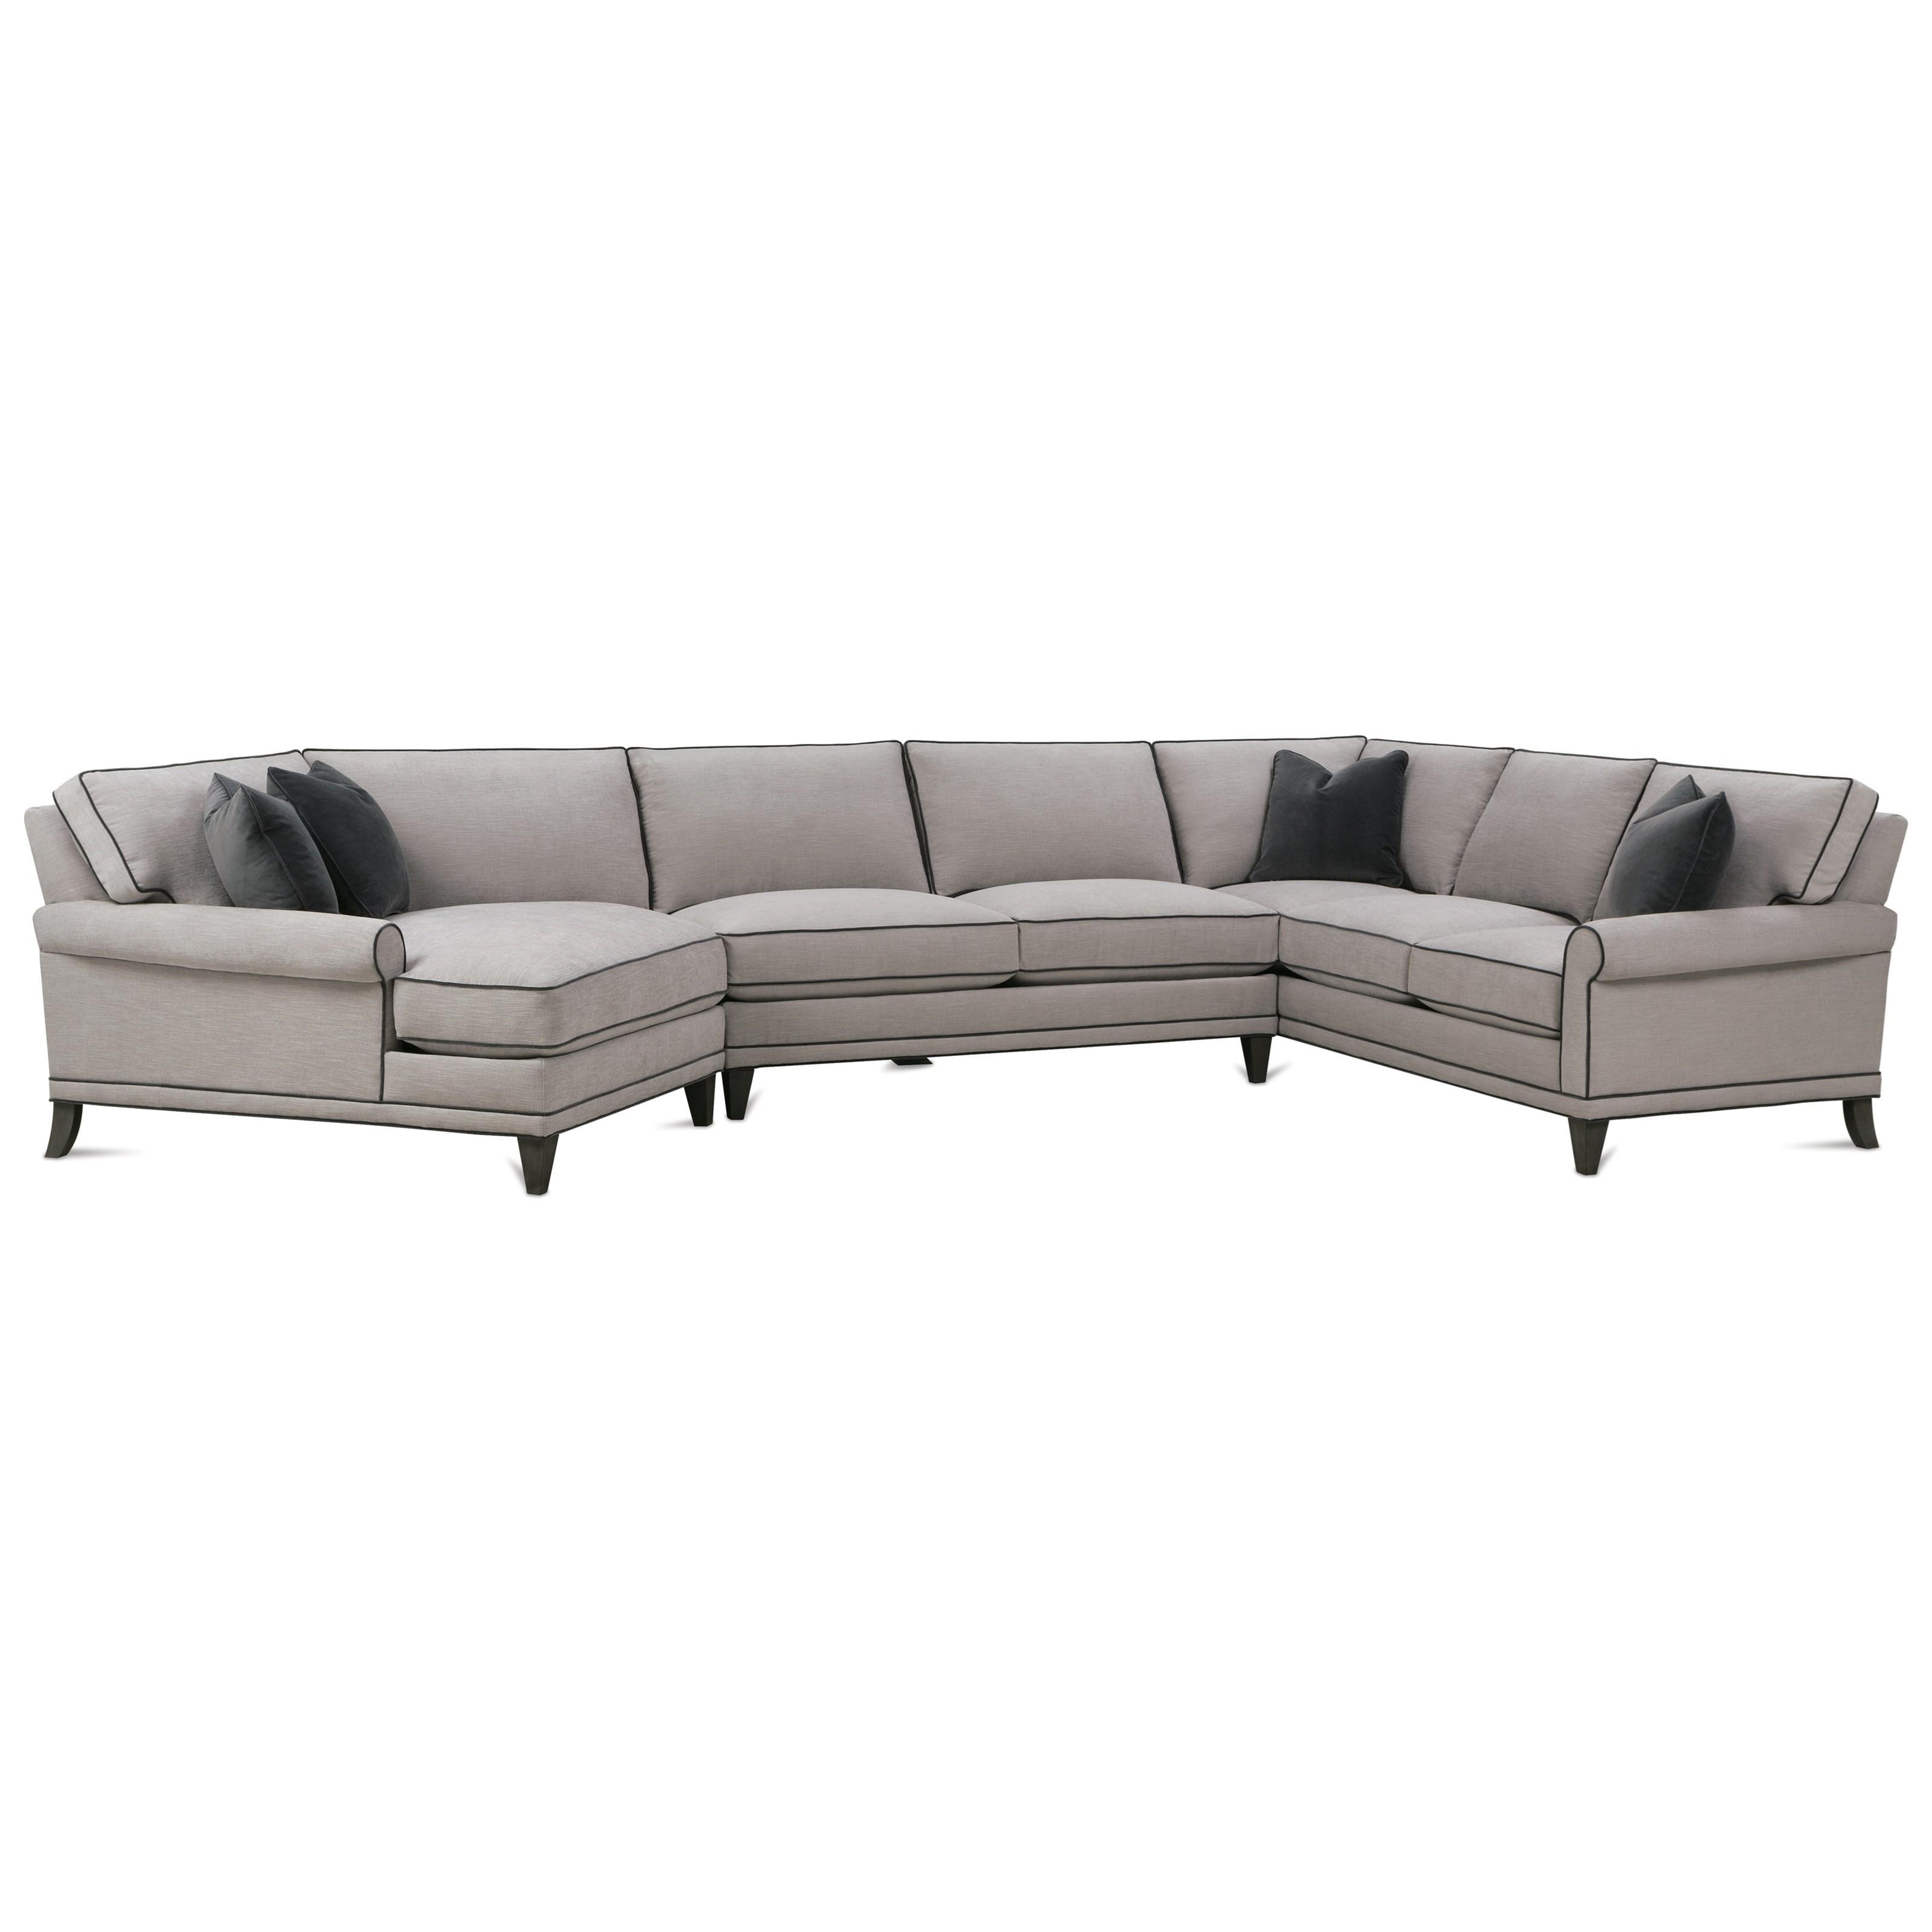 My Style II Customizable Sectional Sofa by Rowe at Bullard Furniture